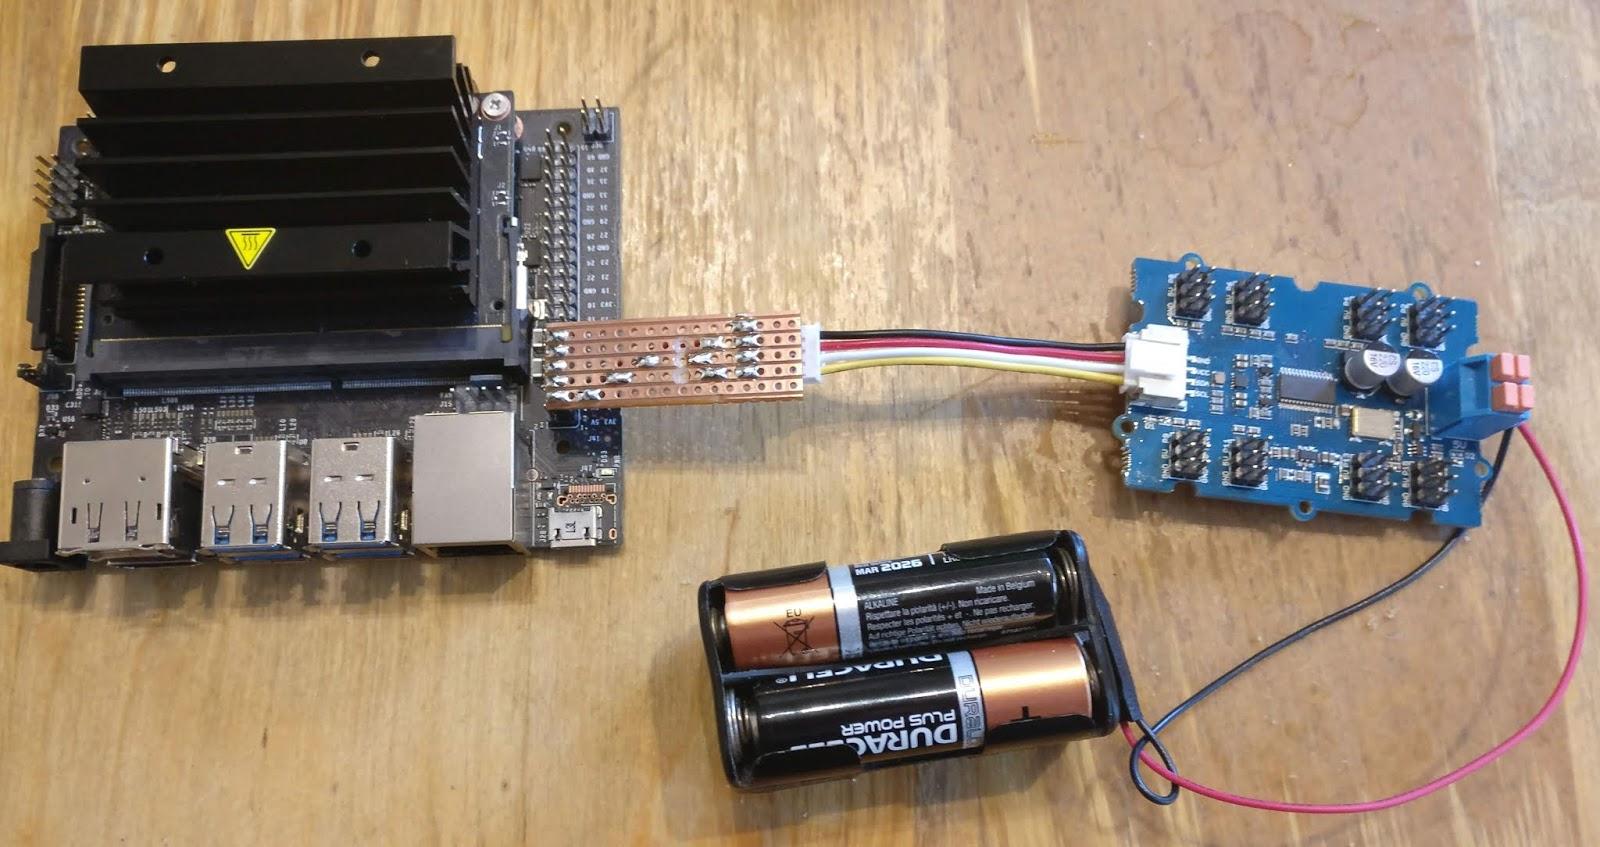 RAREblog: Sambot - MeArm, servos, the Babelboard and Jetson Nano